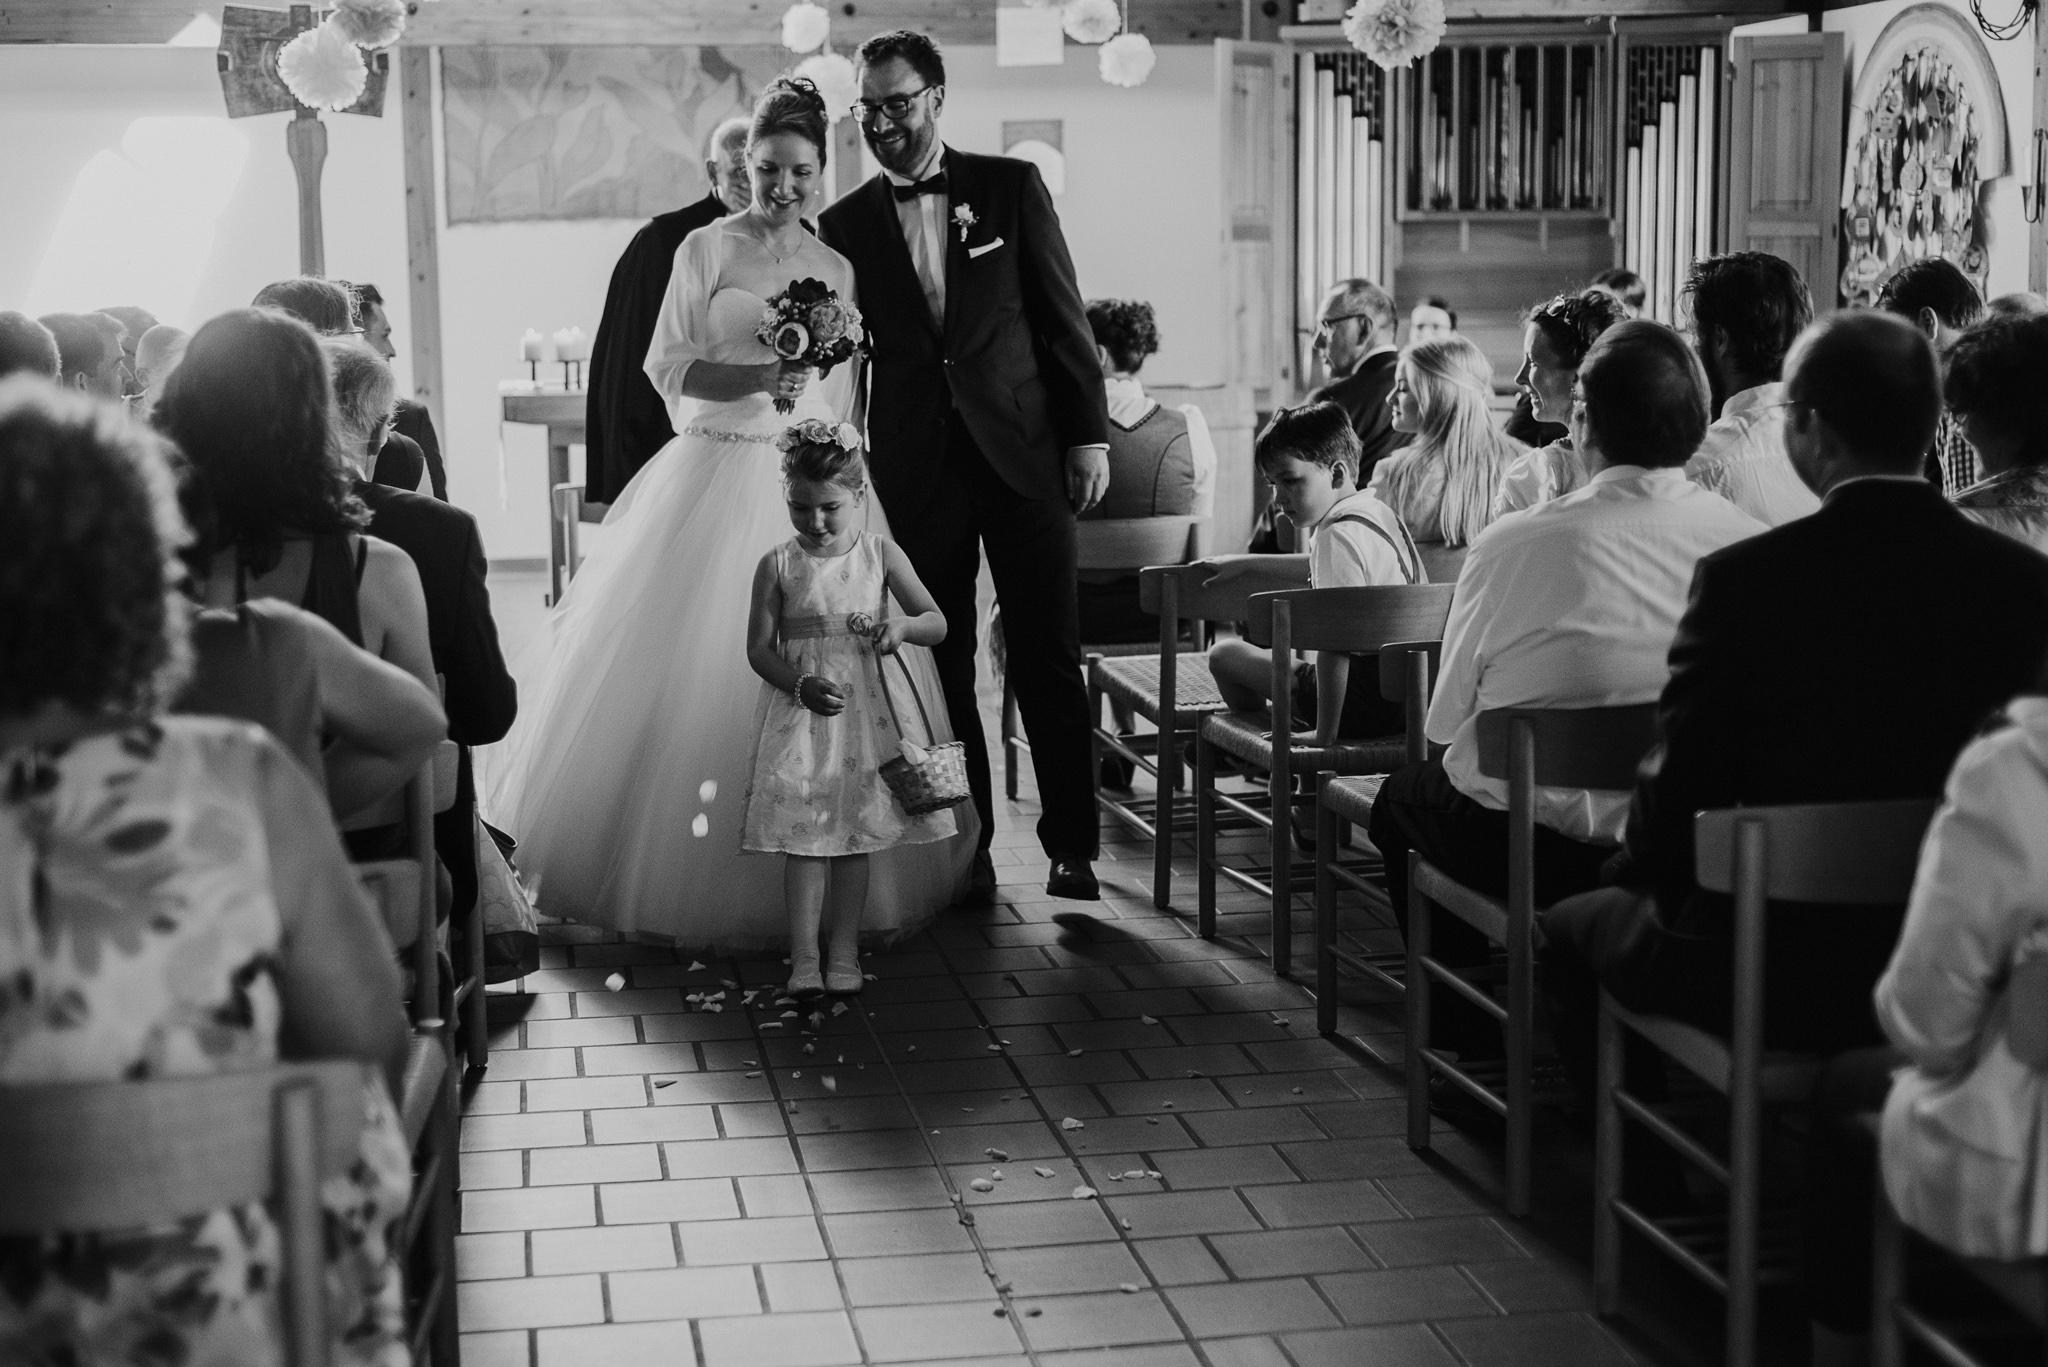 religious ceremony evangelische hochzeit wedding bayern bavaria germany kunstmühle rosenheim photography